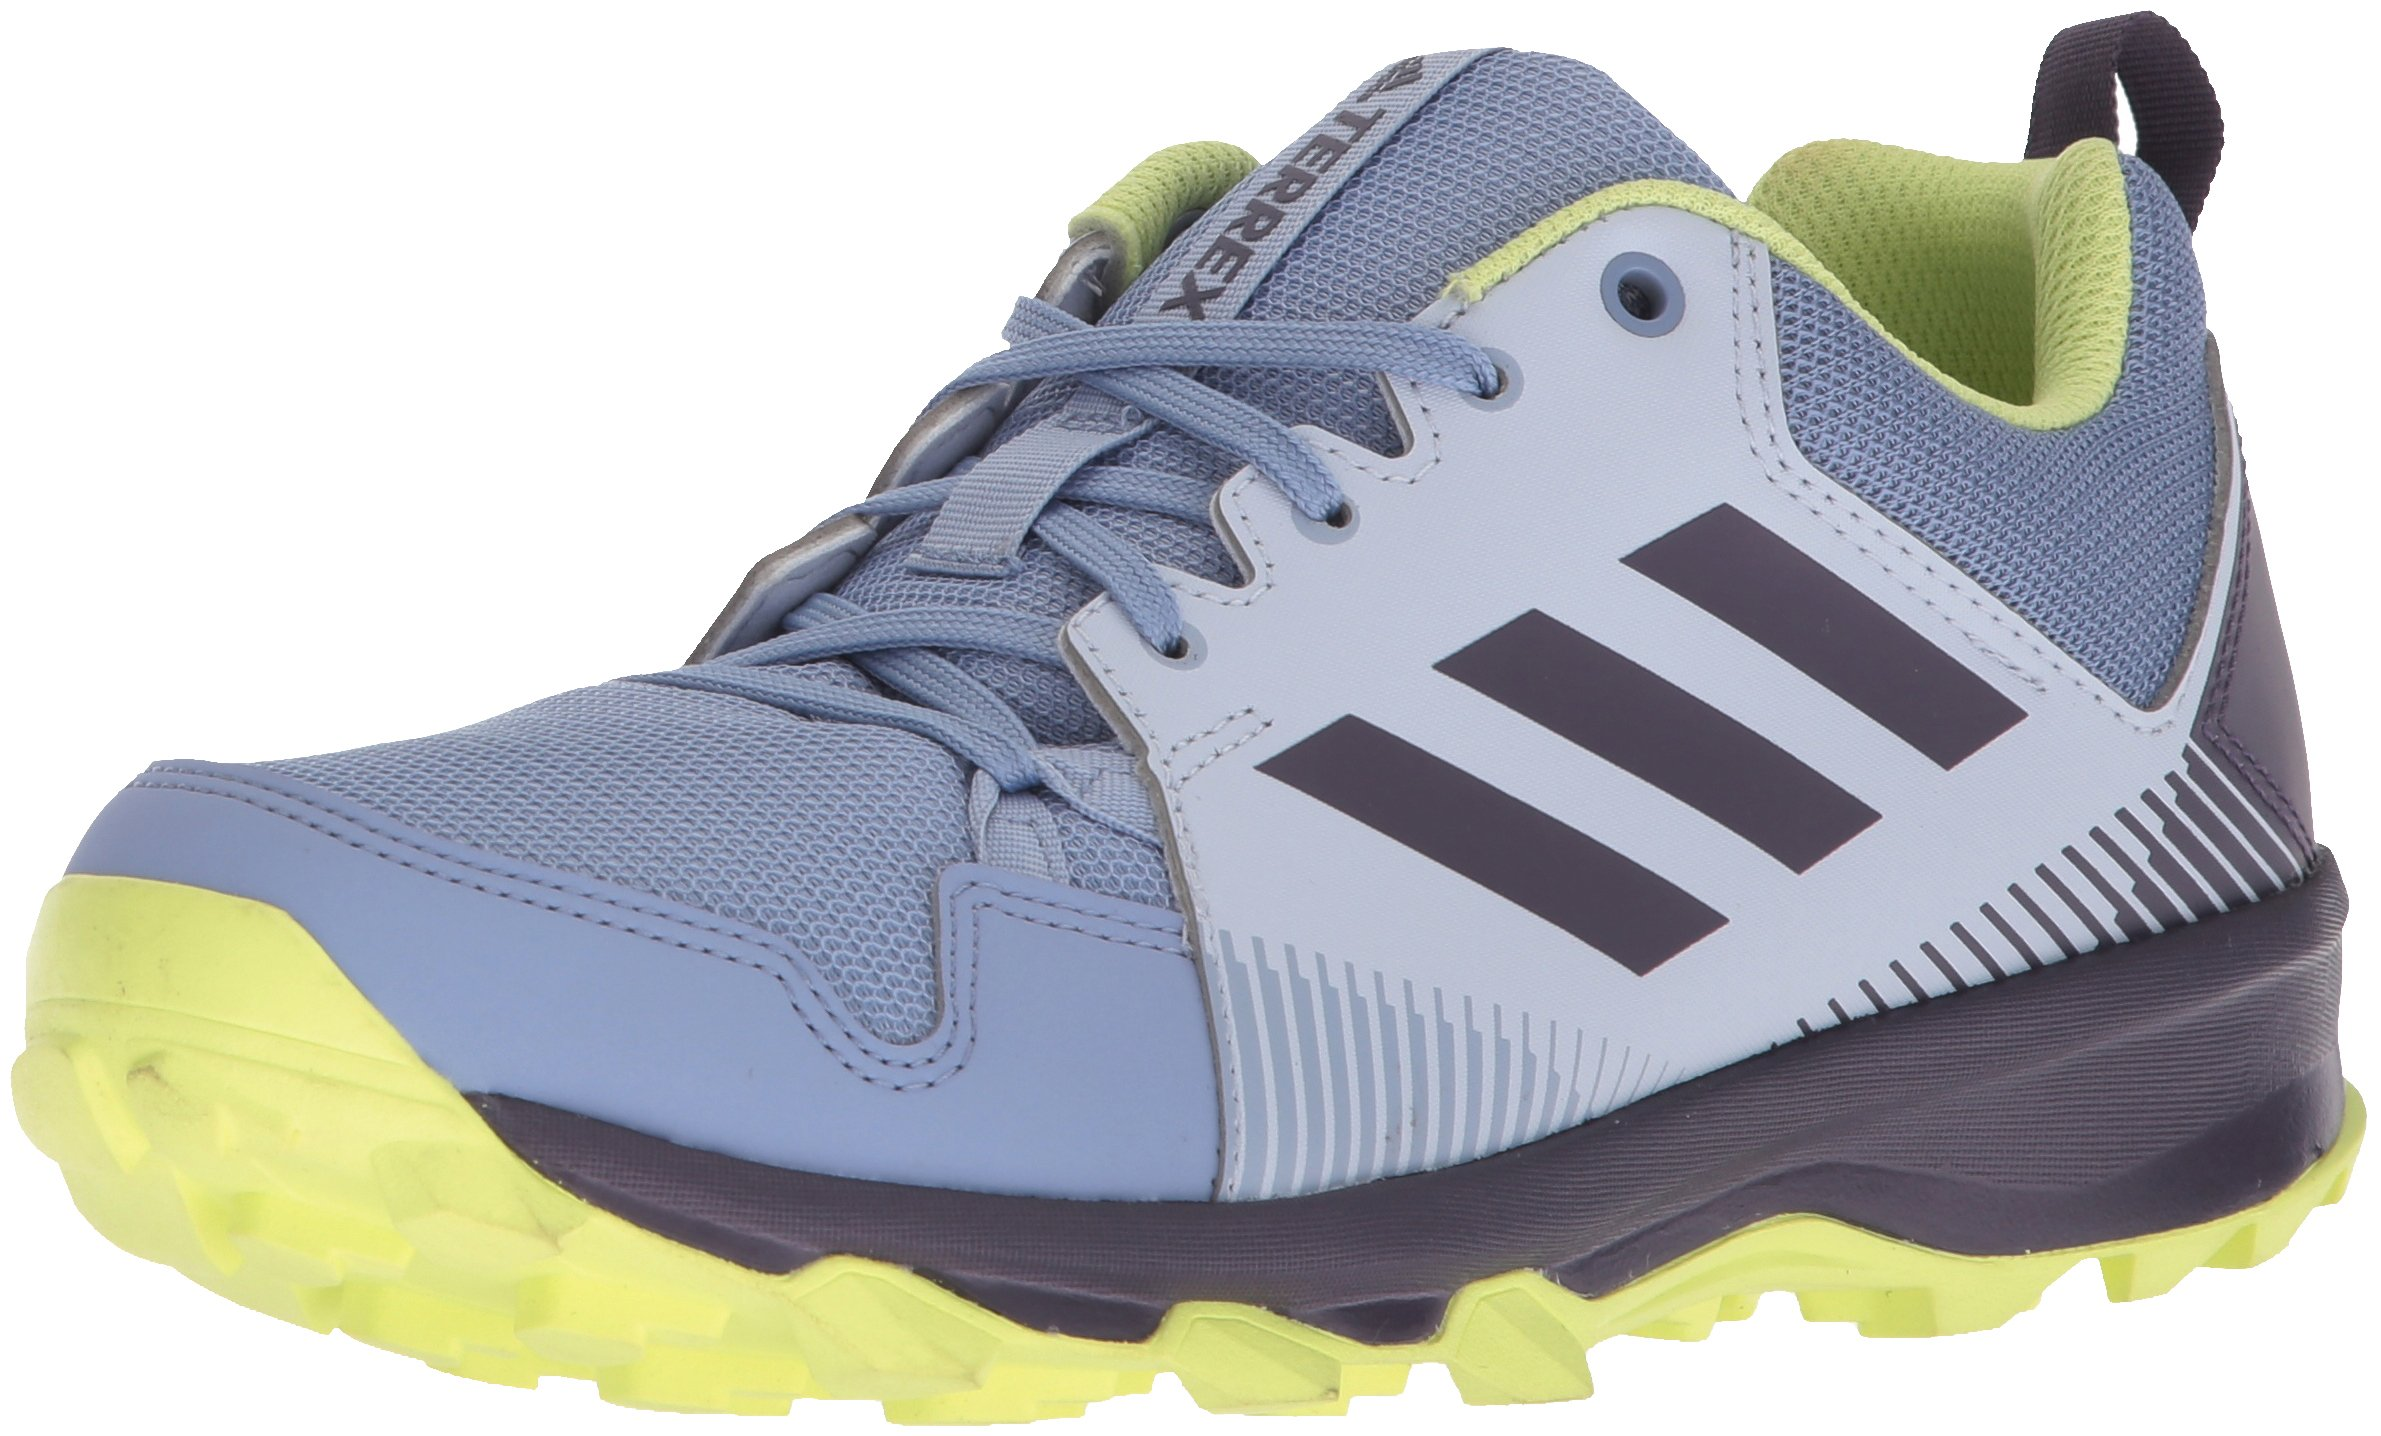 adidas outdoor Women's Terrex Tracerocker W Trail Running Shoe, Aero Blue/Trace Purple/Semi Frozen Yellow, 8 M US by adidas outdoor (Image #1)